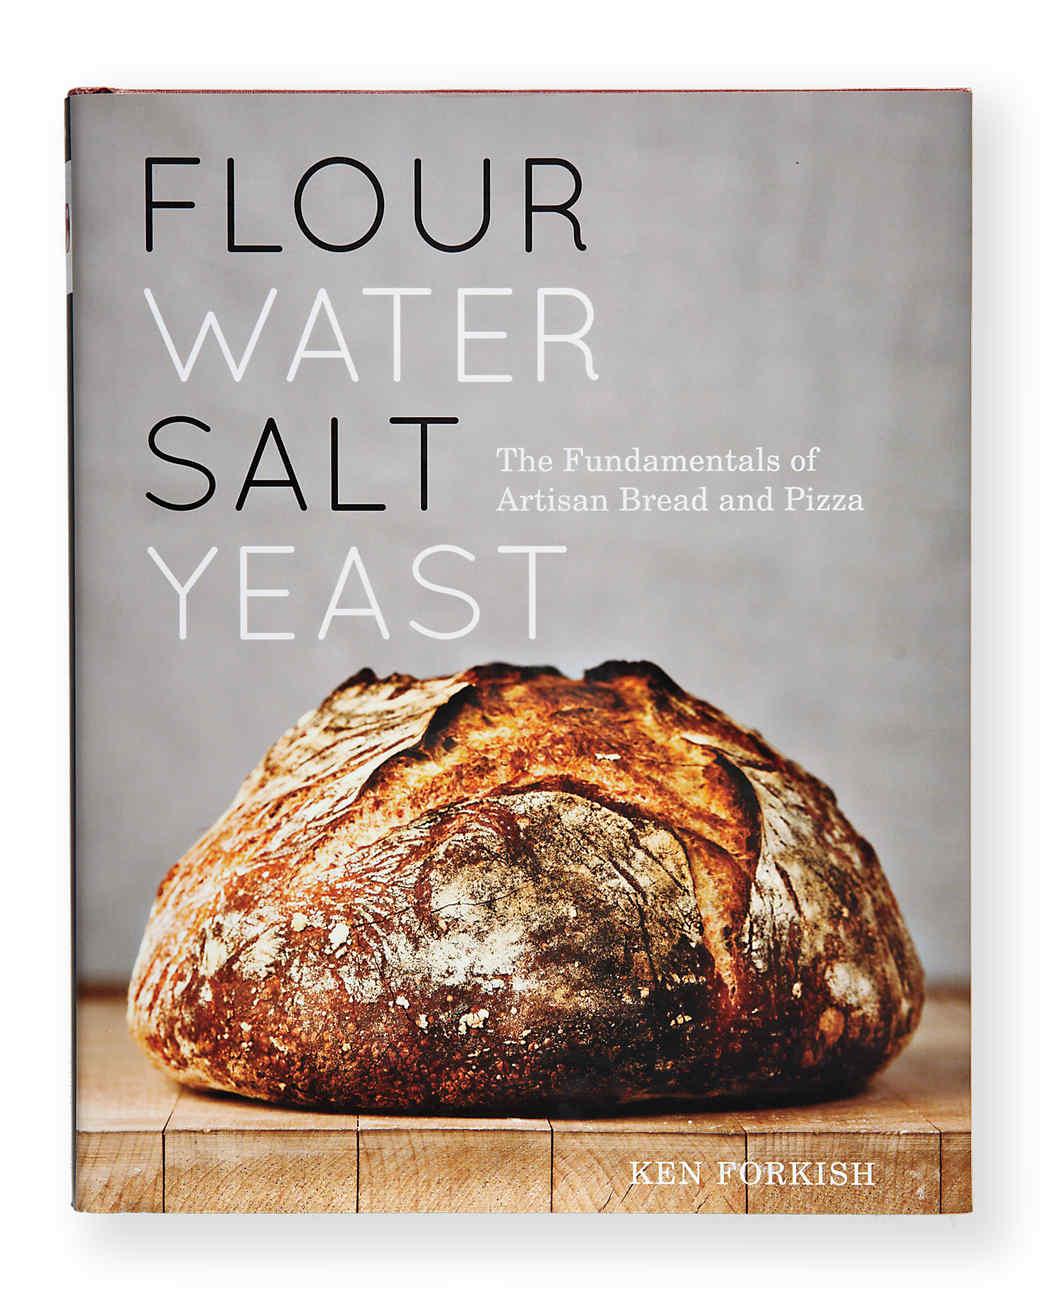 flour-water-salt-yeast-033-mld109433.jpg